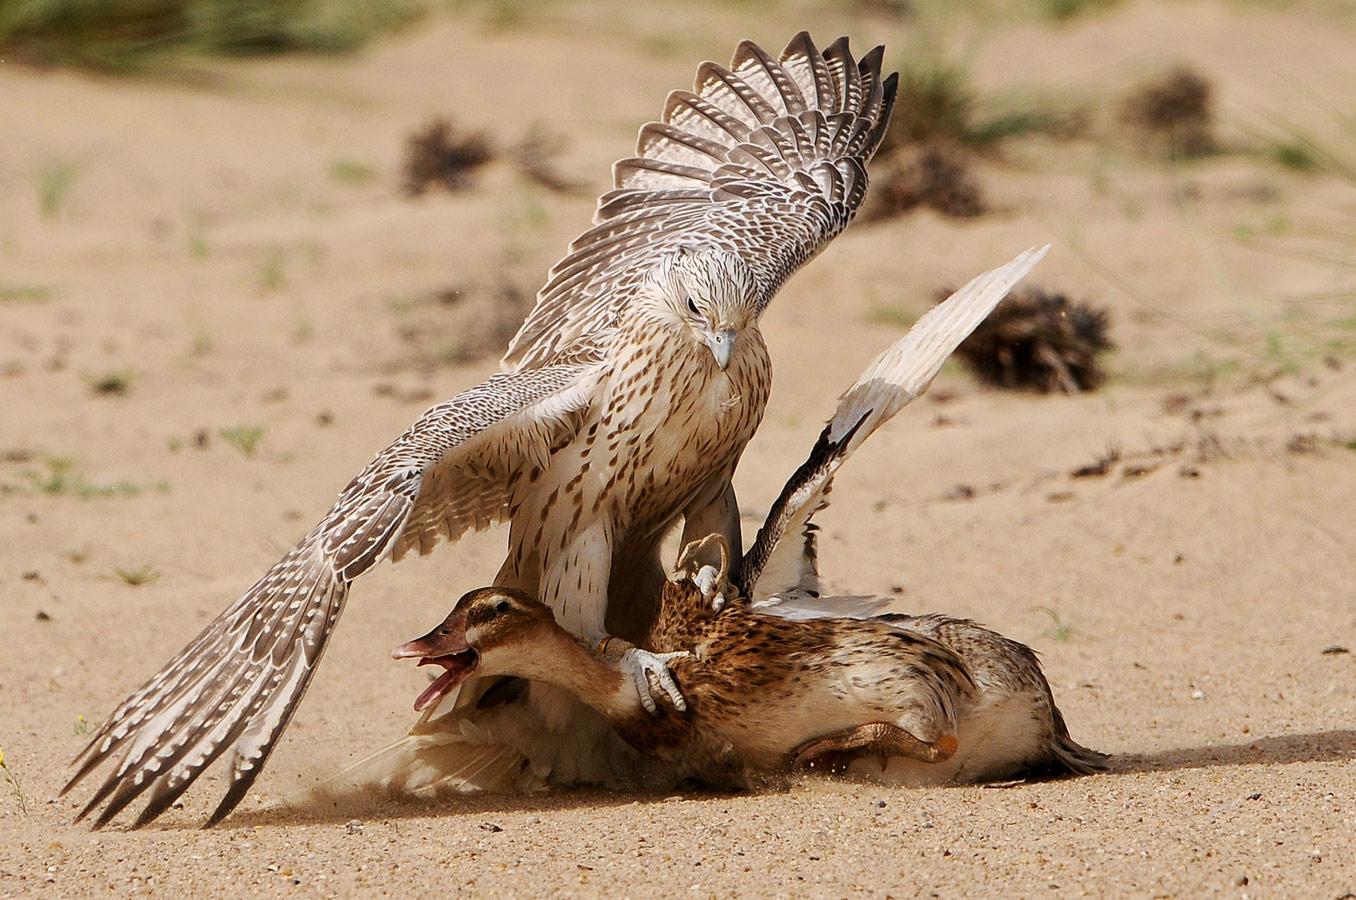 The bird wisdom, © Saad Alfarhan, Turkey, Wildlife Nomination, 3 place, 35AWARDS Photo Contest